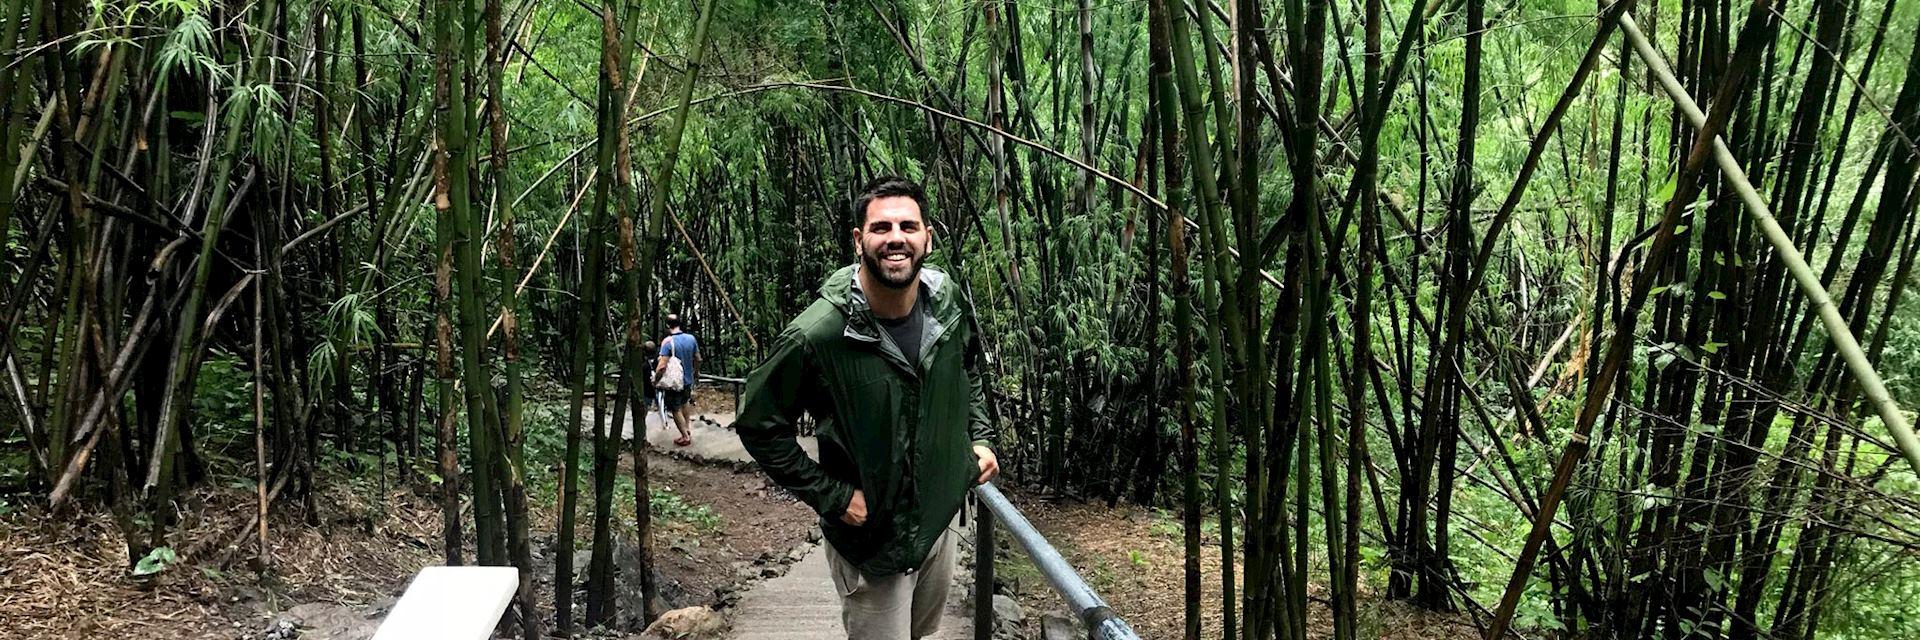 Ian hiking to Hellfire Pass, Thailand